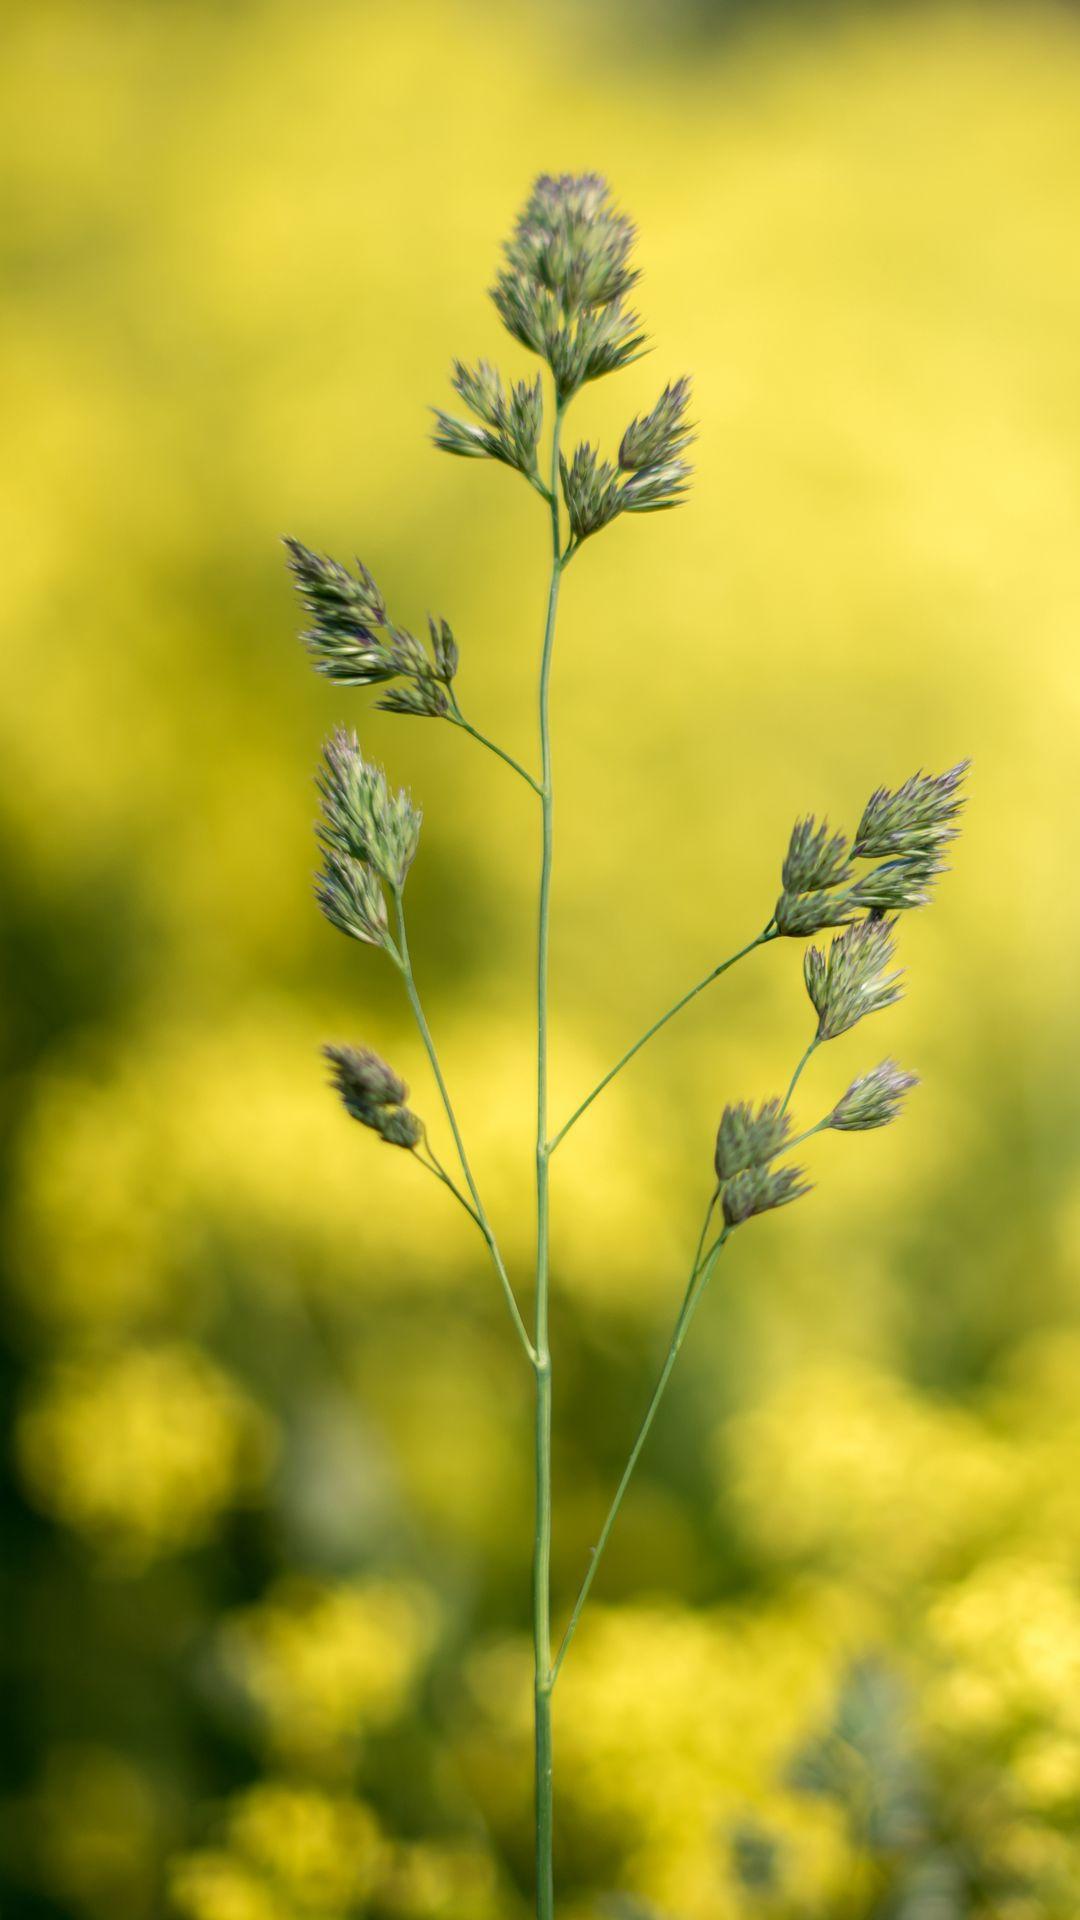 1080x1920 Wallpaper grass, plant, macro, inflorescence, closeup